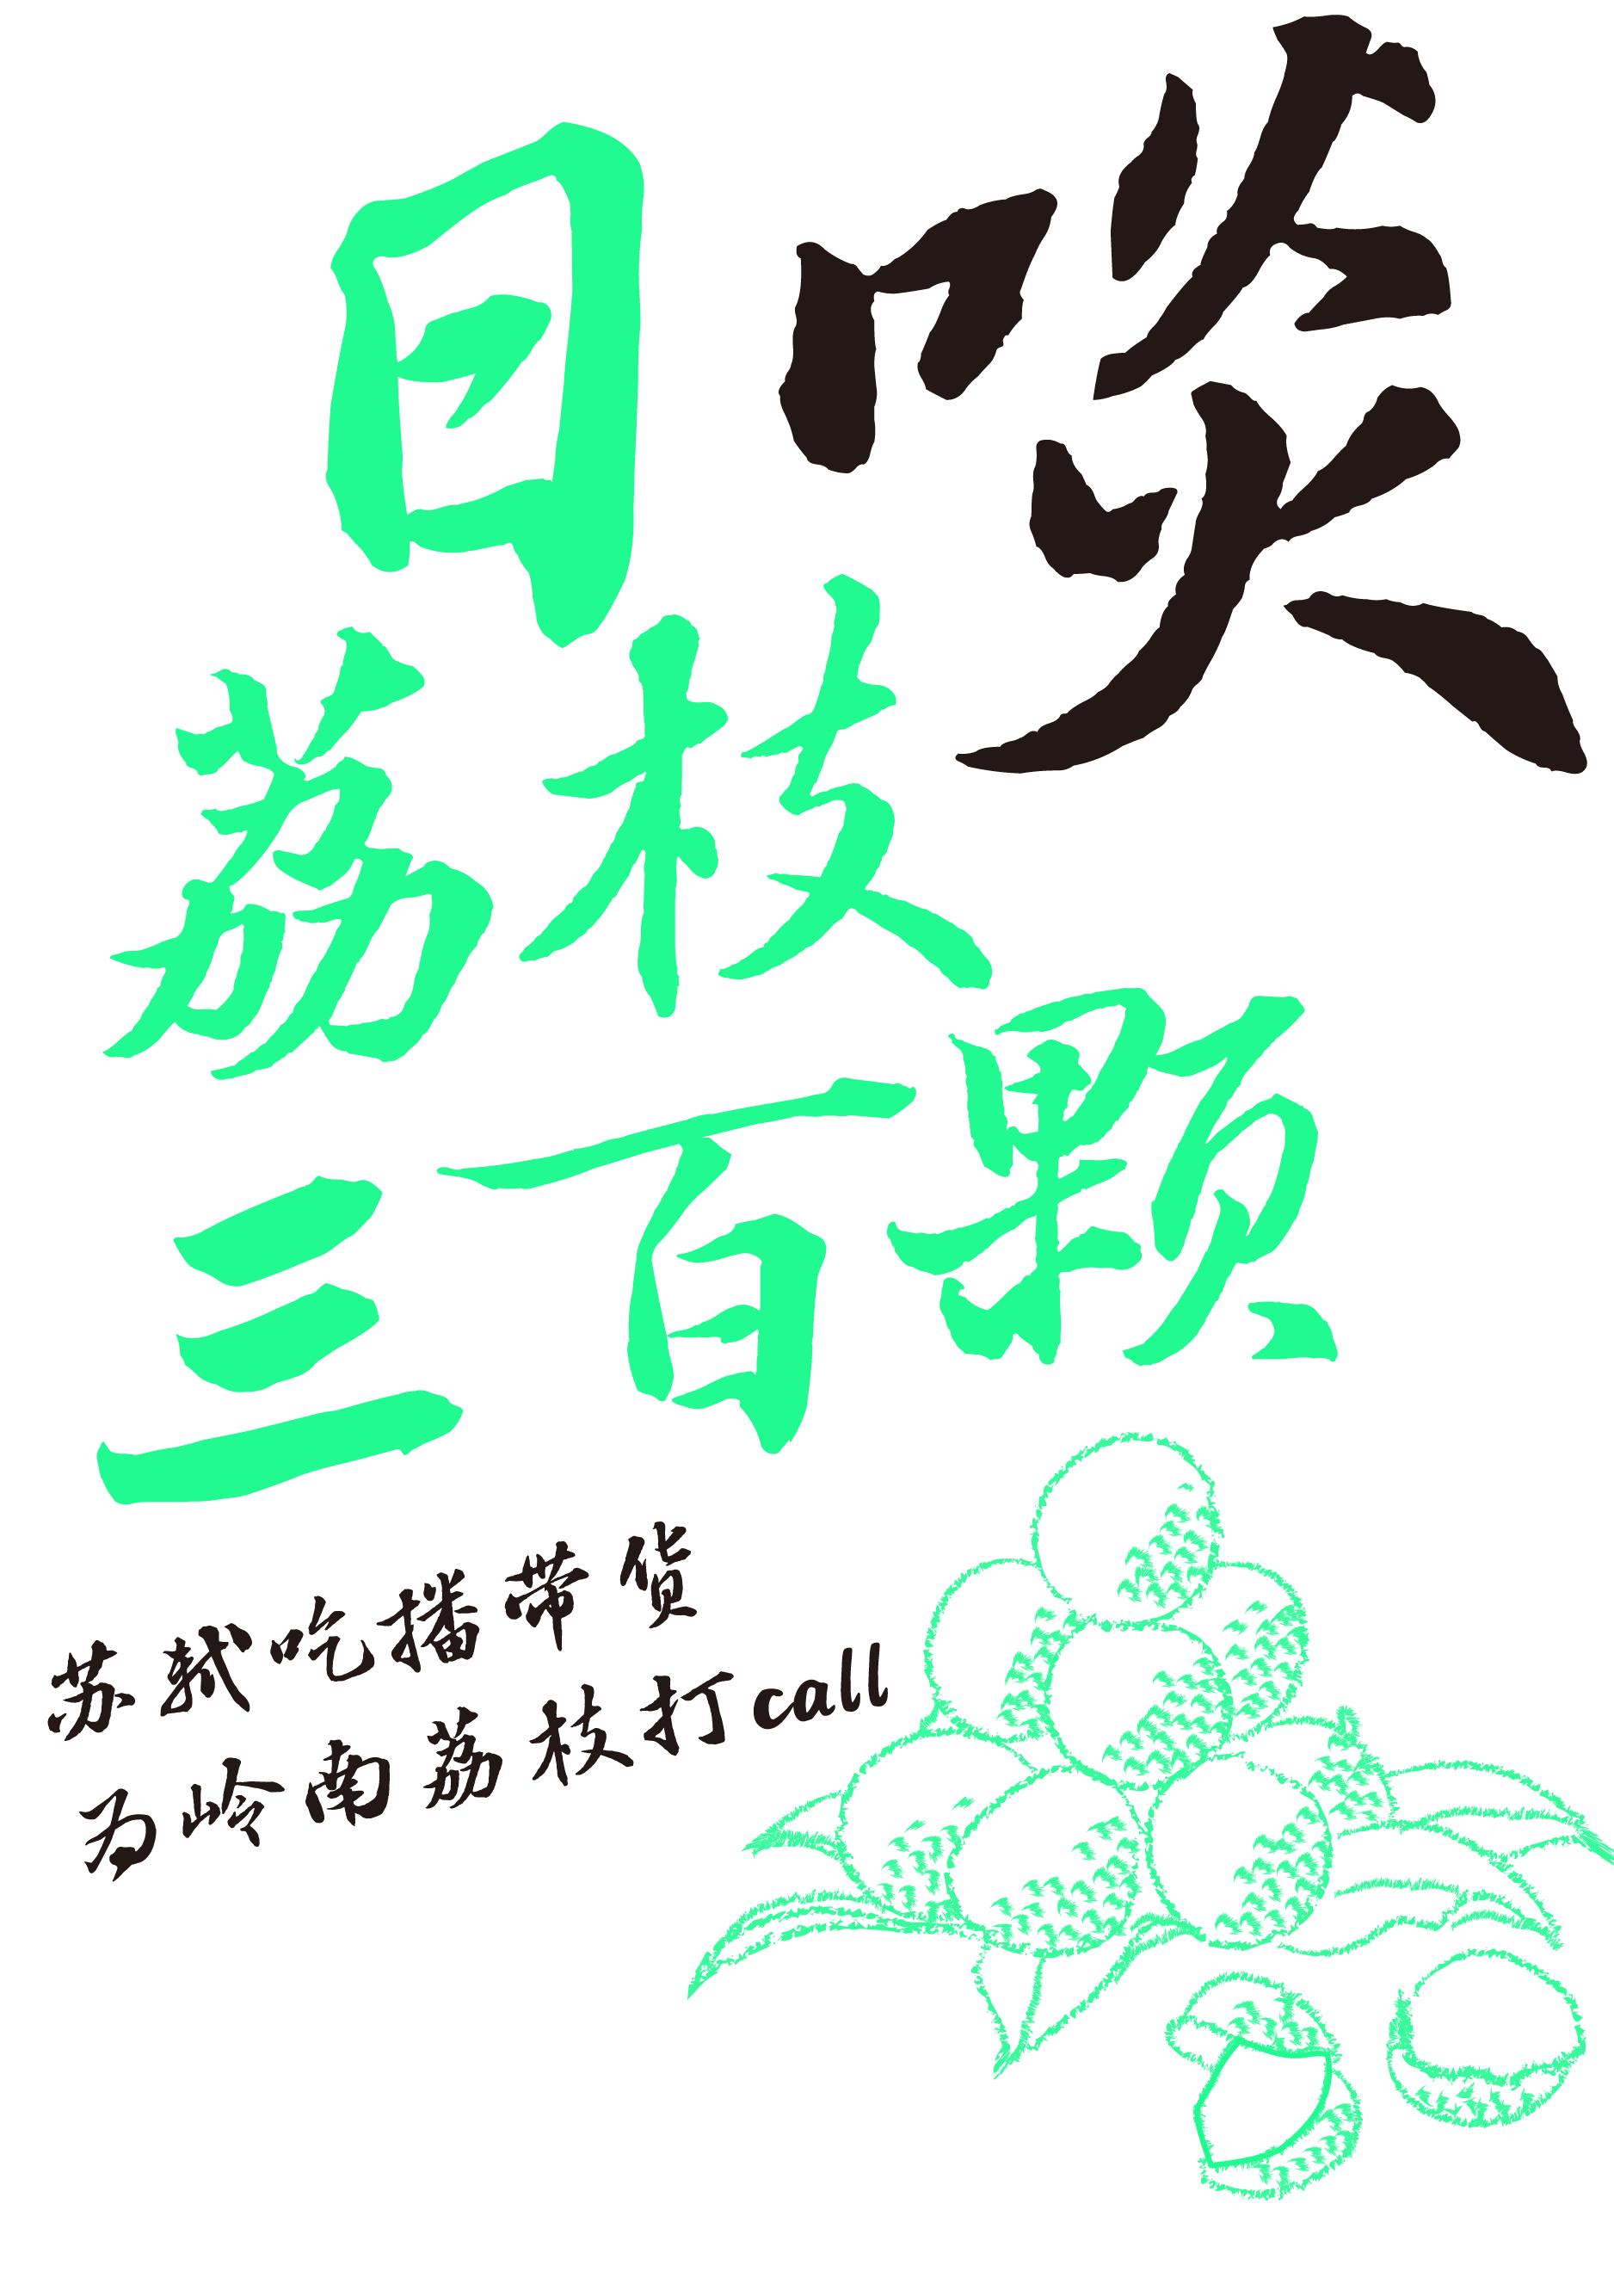 https://cdn1.zijia.com.cn/Public/Uploads/mainsort/mainsort_1602816058_8050.png